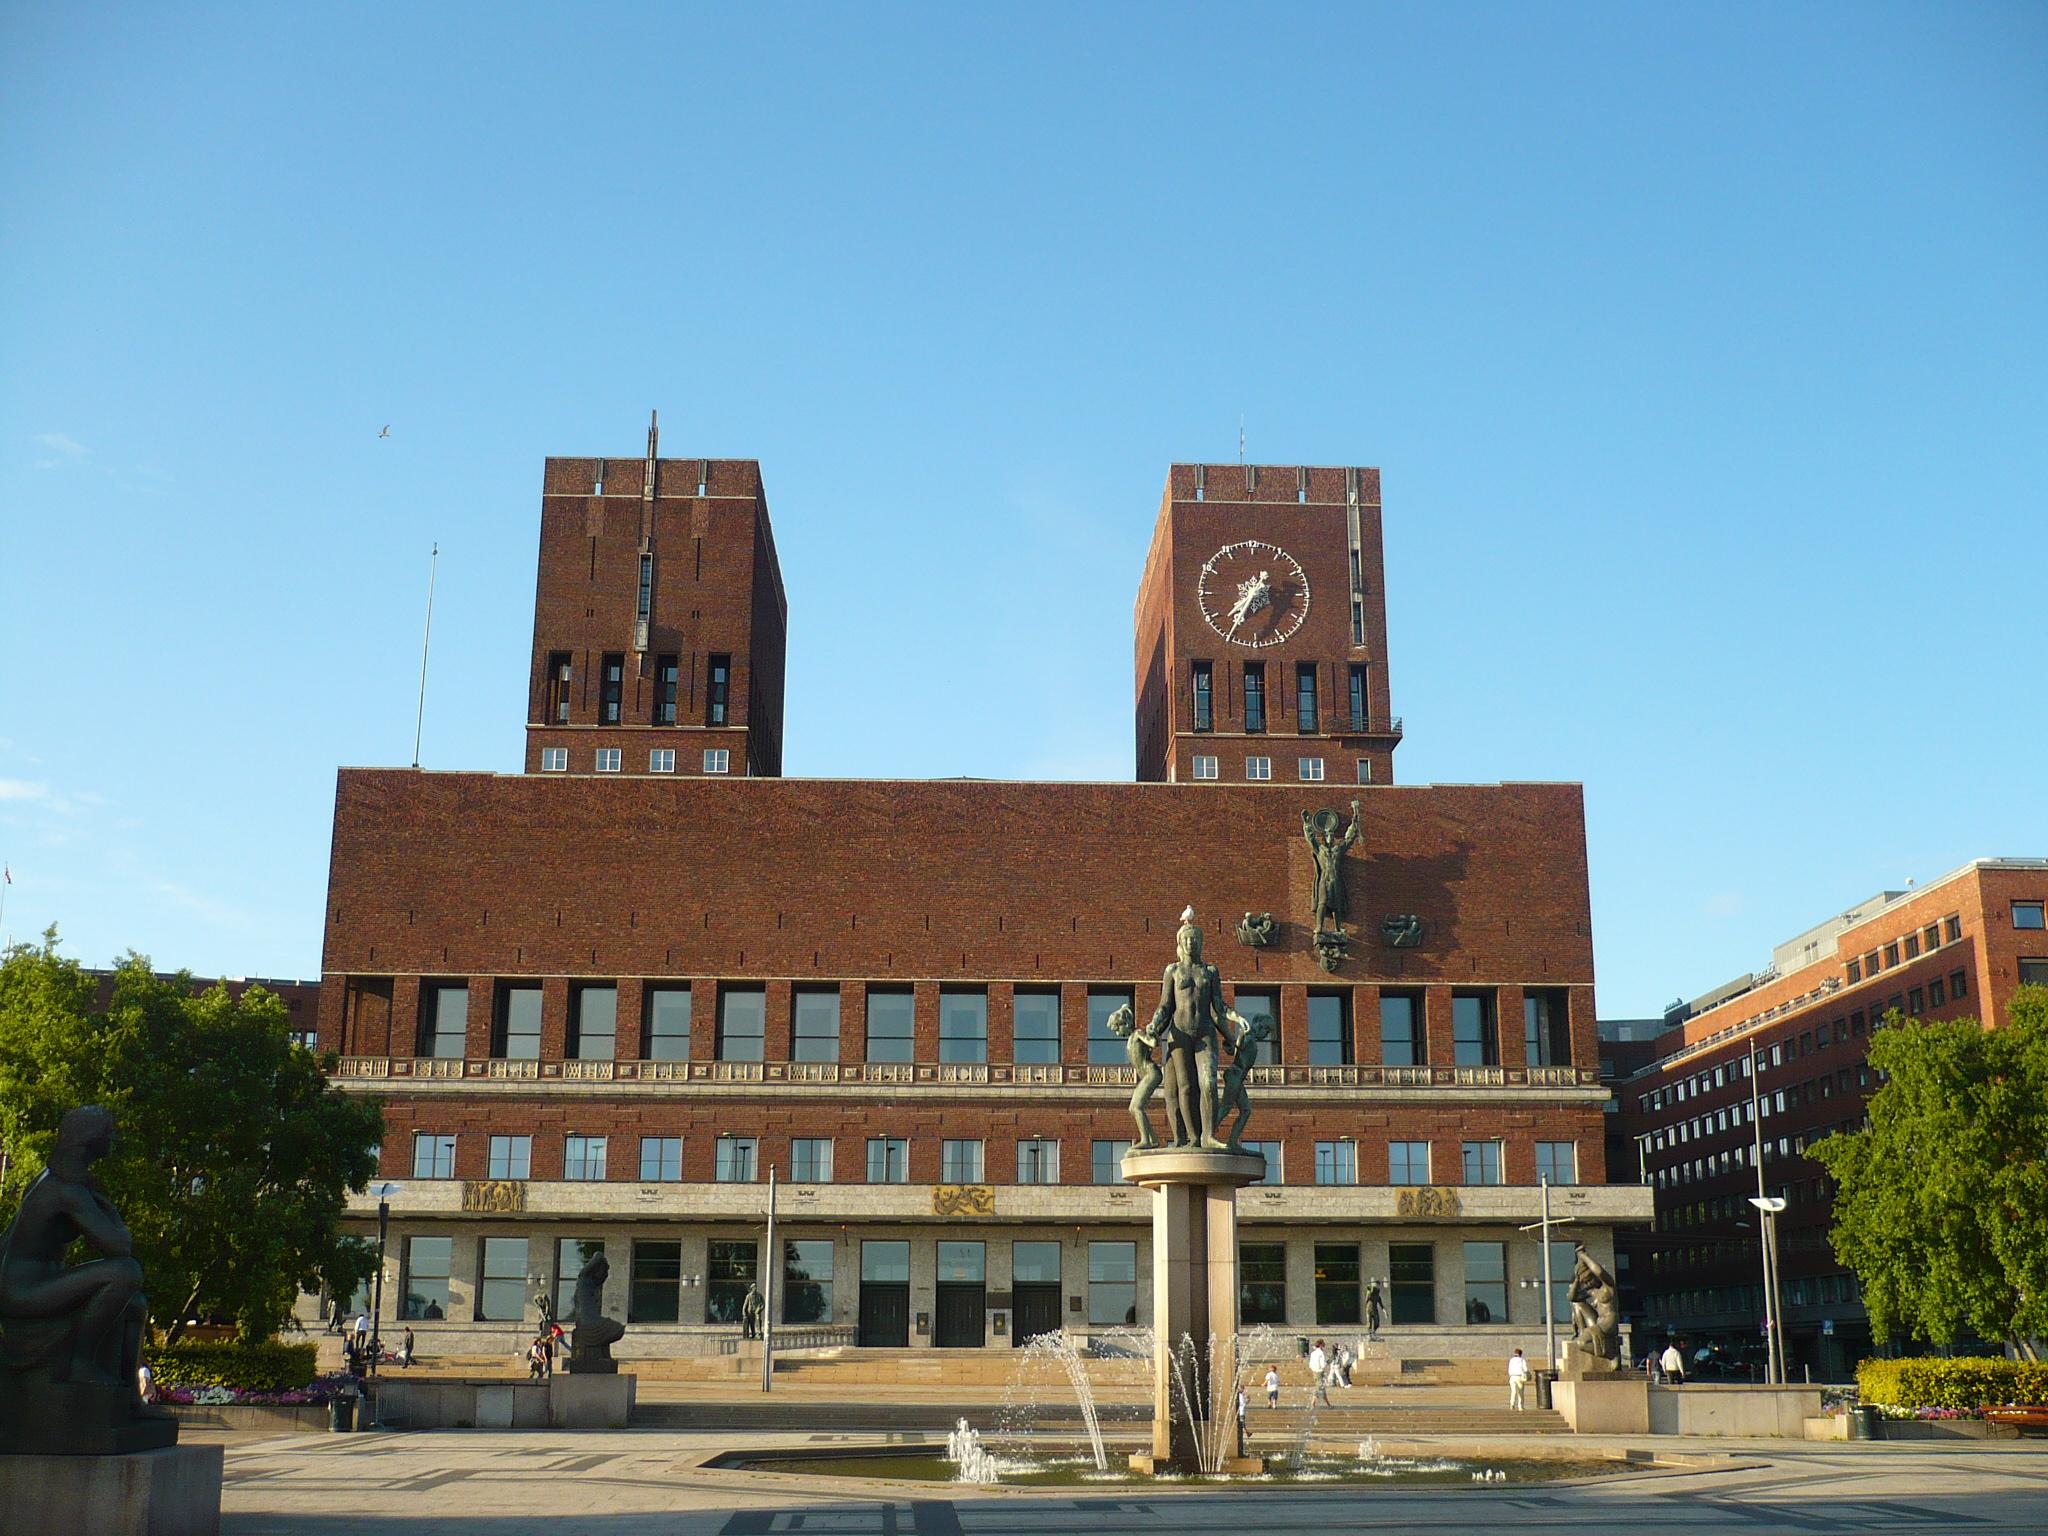 Oslo - The City Hall